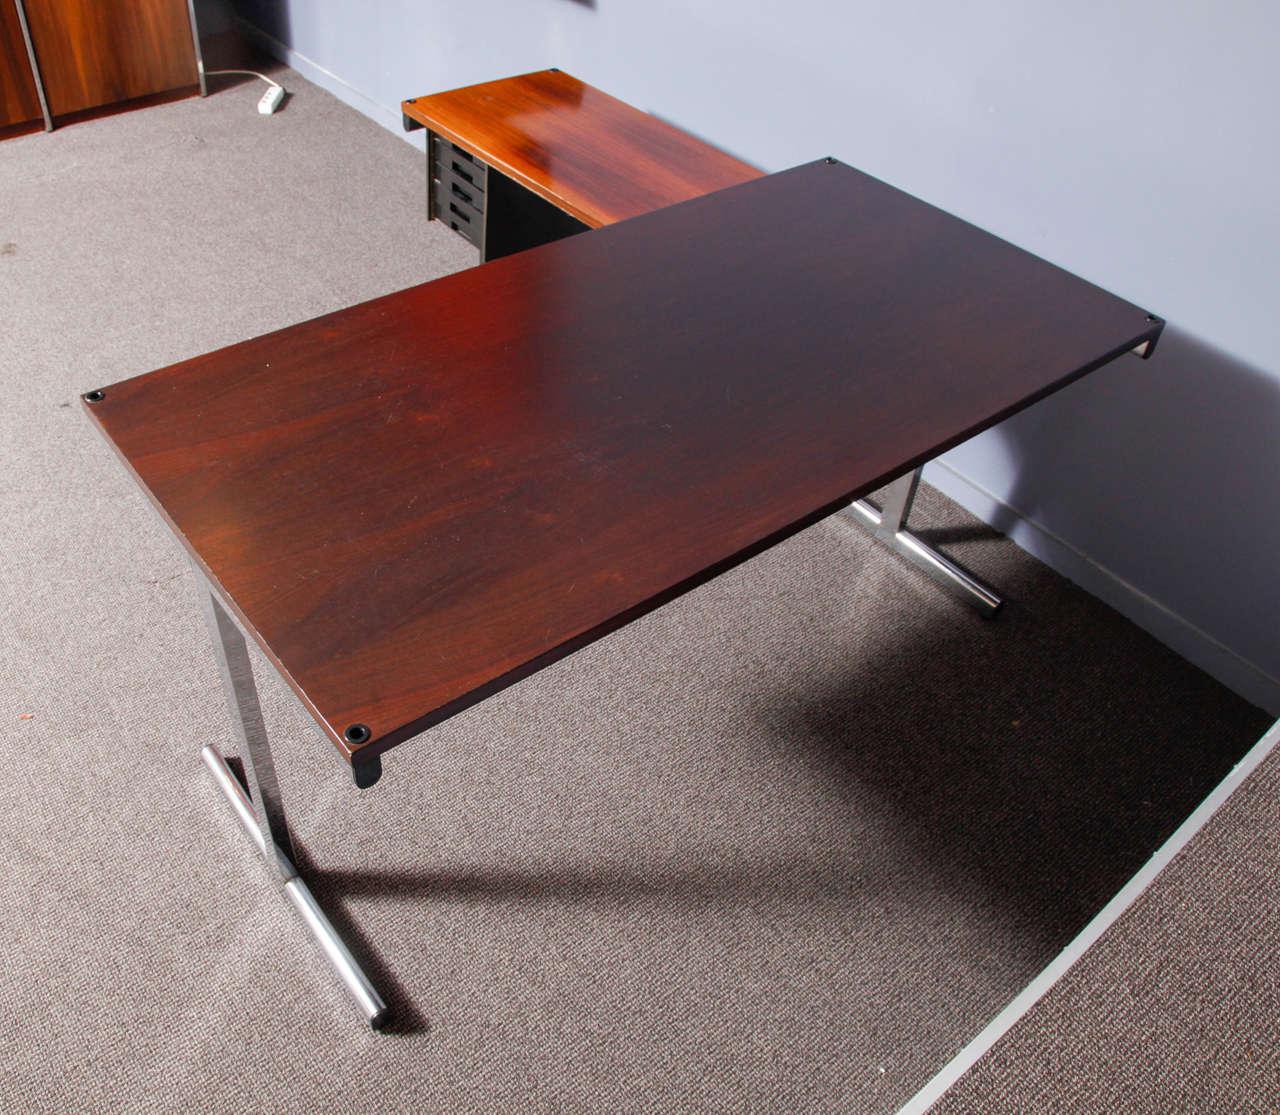 Executive desk from mim mobili italiani moderni modernism - Mobili italiani design ...